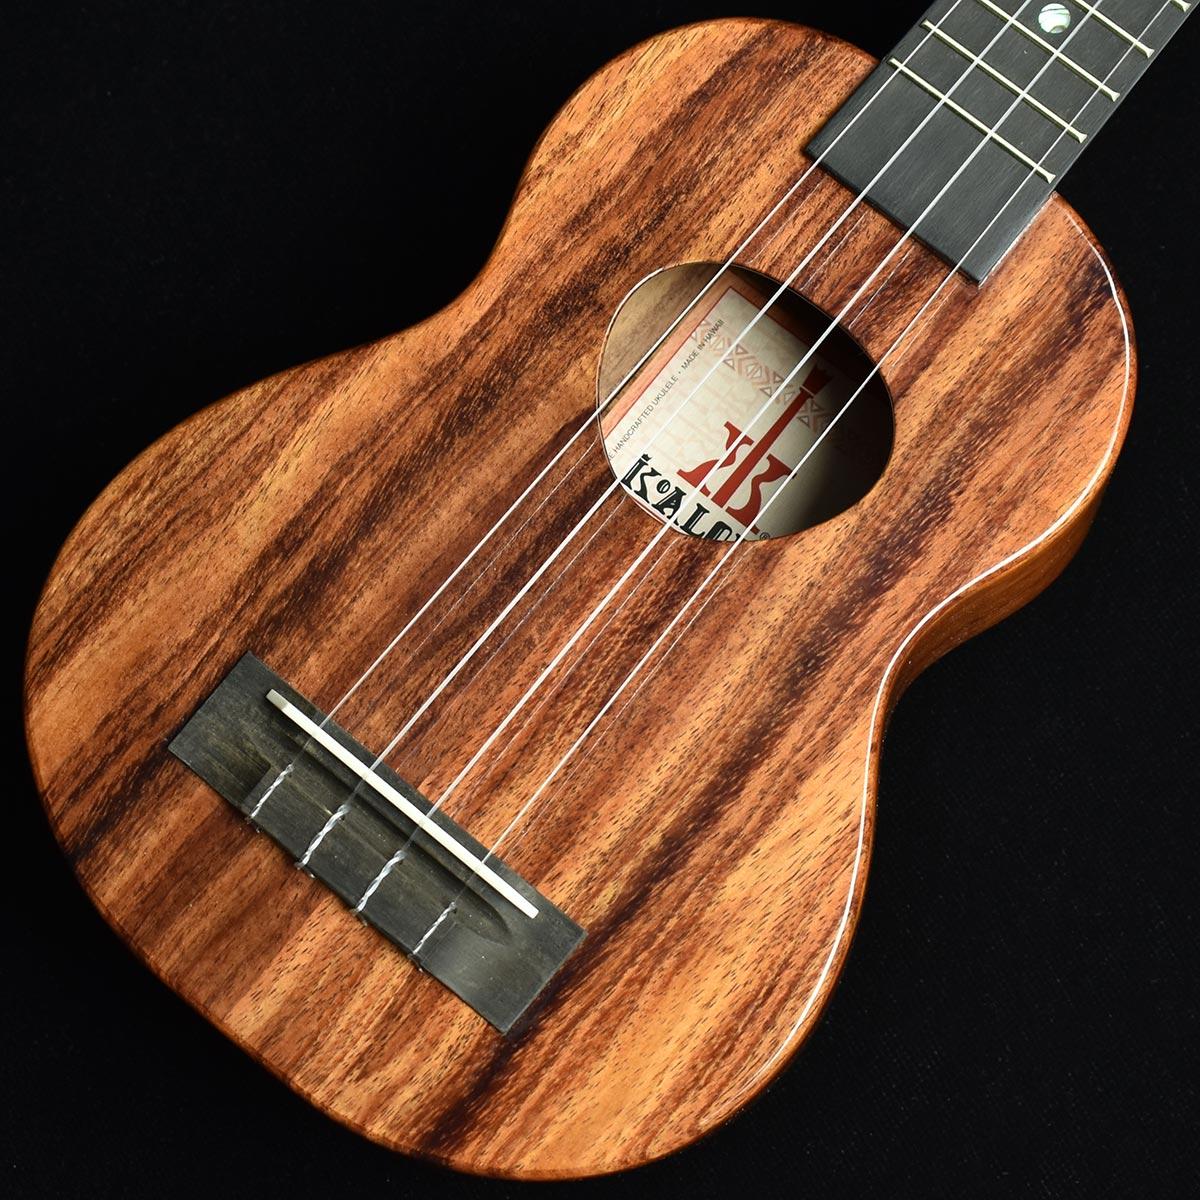 KoAloha KSM-00 UG Soprano 【ハワイアンコア材】【ハワイ製ソプラノウクレレ】 【コアロハ】【未展示品】